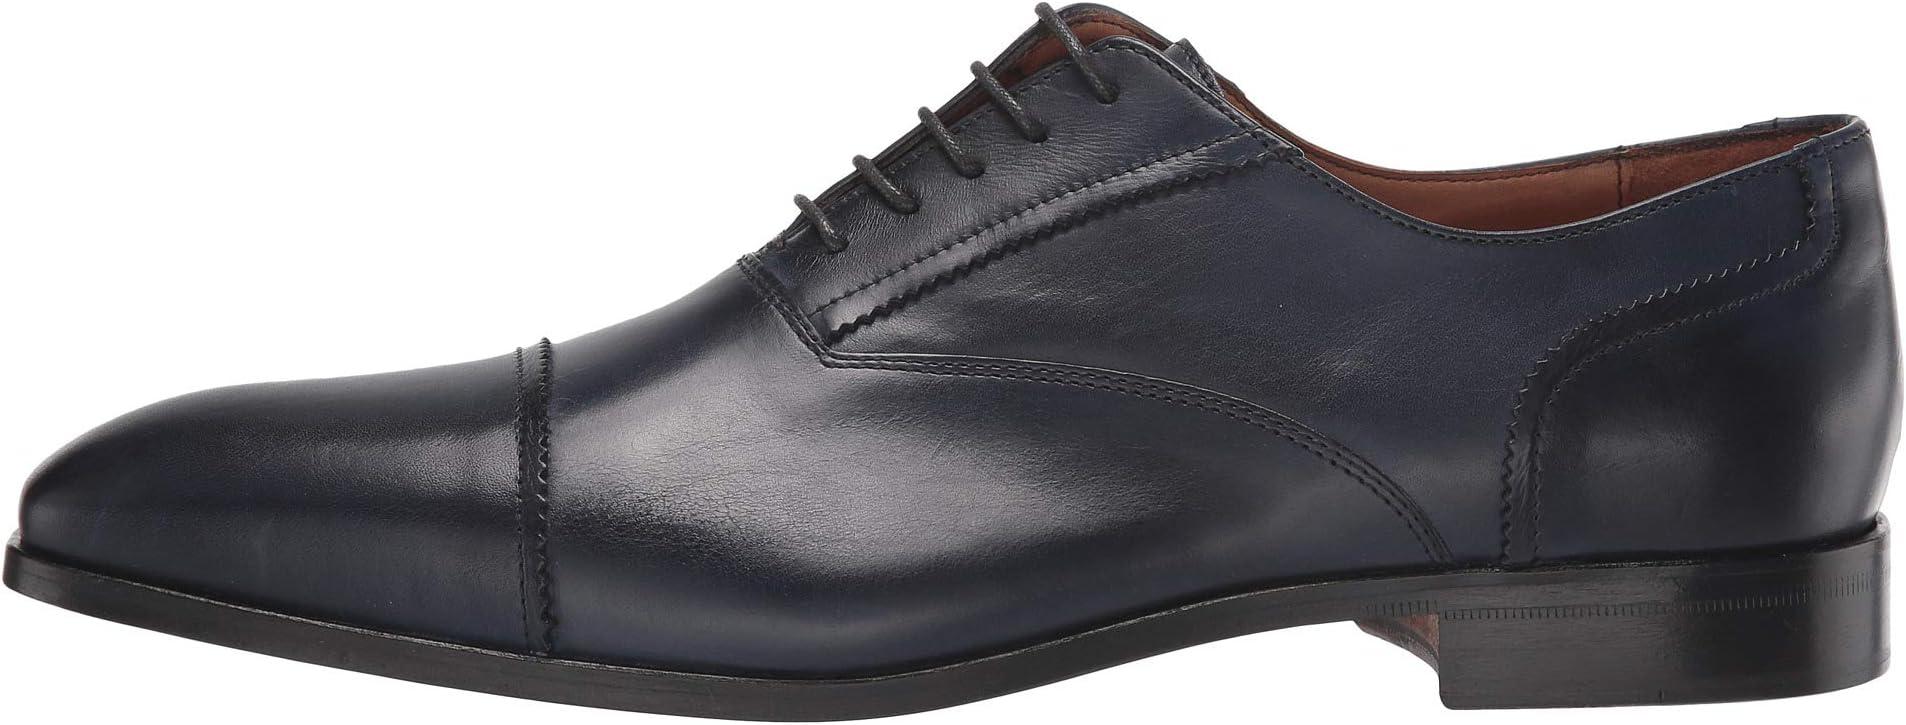 Massimo Matteo Dante Cap Toe Bal   Men's shoes   2020 Newest